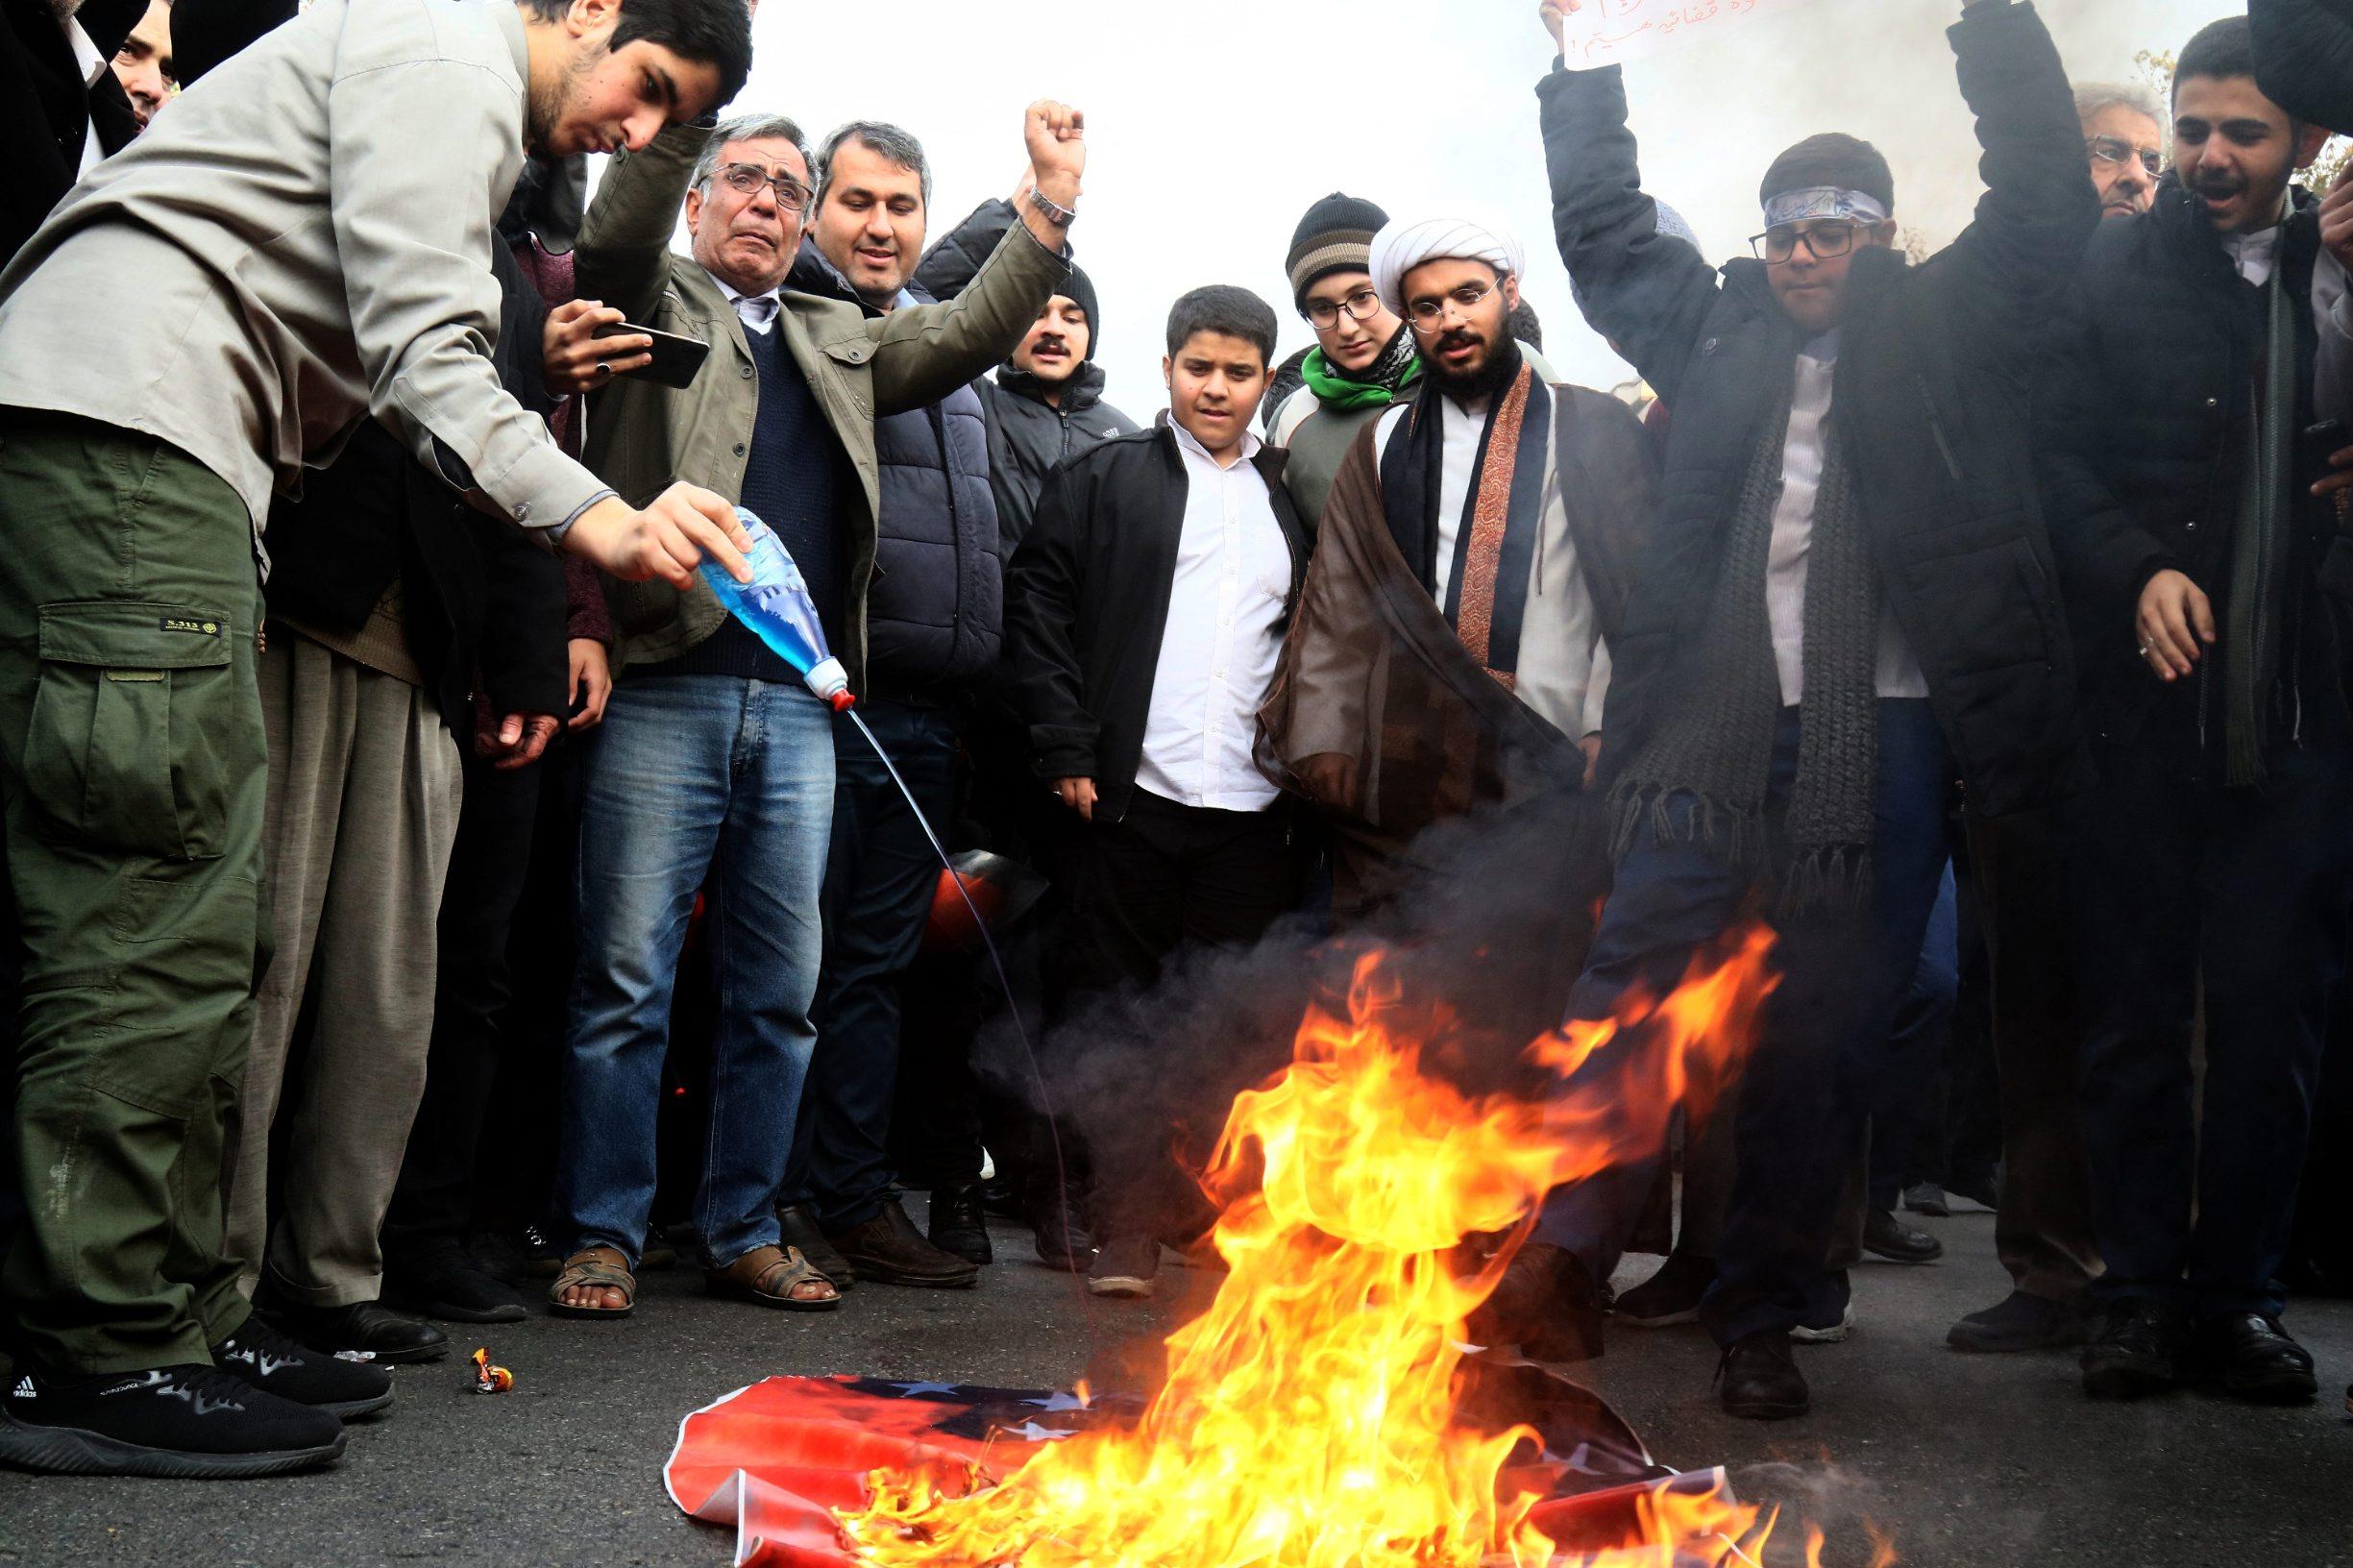 2019-11-25T142732Z_2048823747_RC2EID91ZN9S_RTRMADP_3_IRAN-GASOLINE-PROTESTS